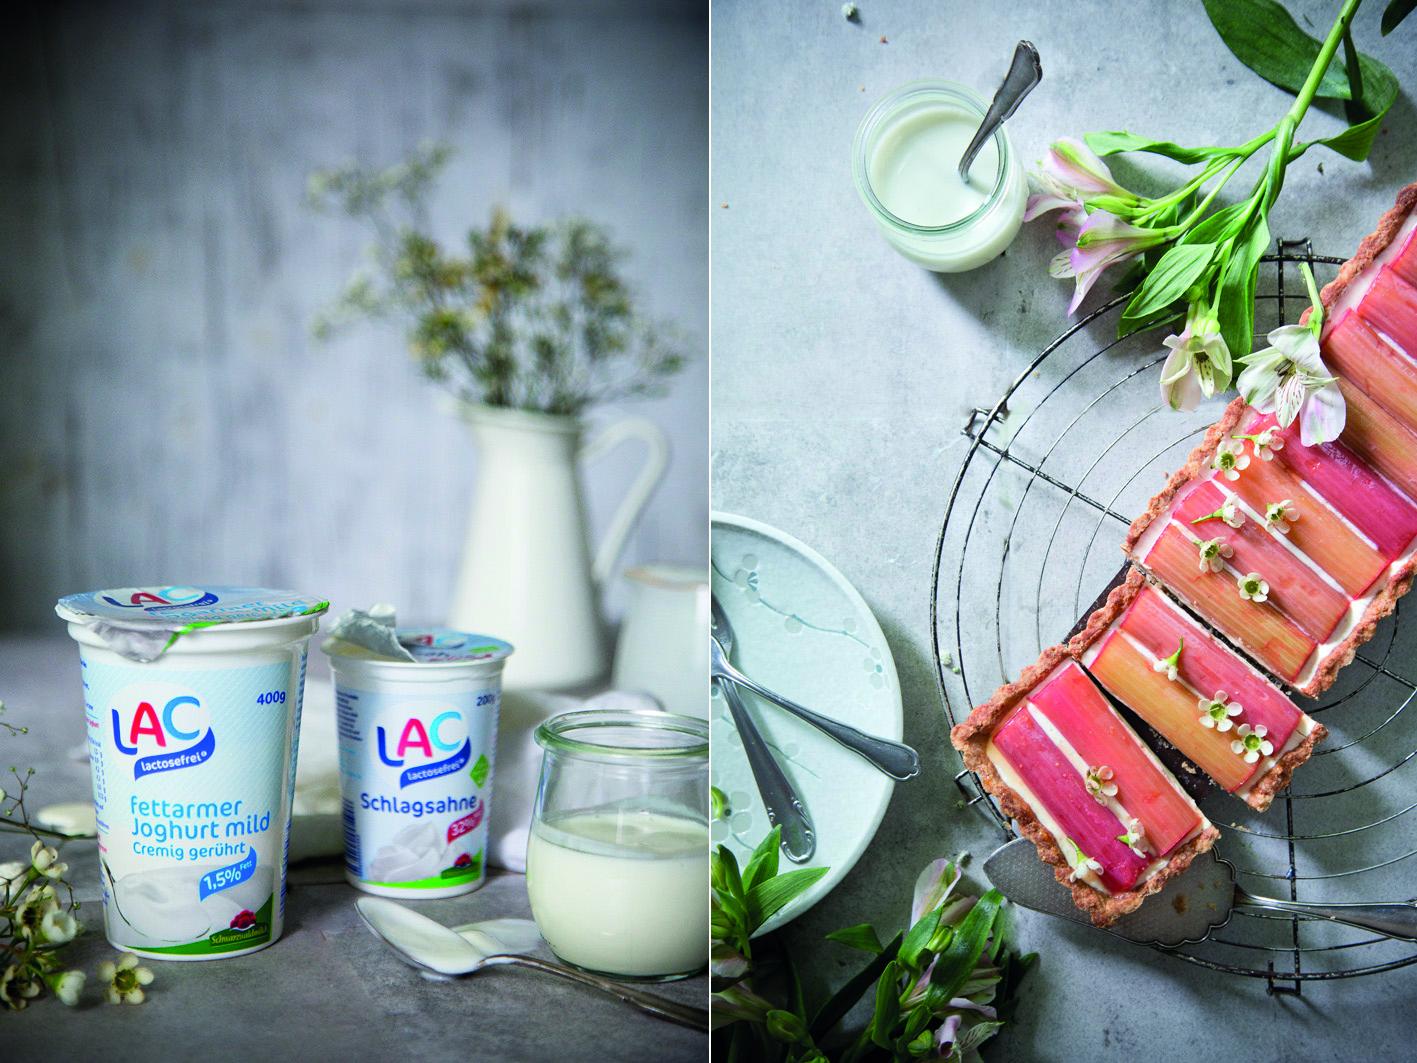 Laktosefreie Joghurt Tarte